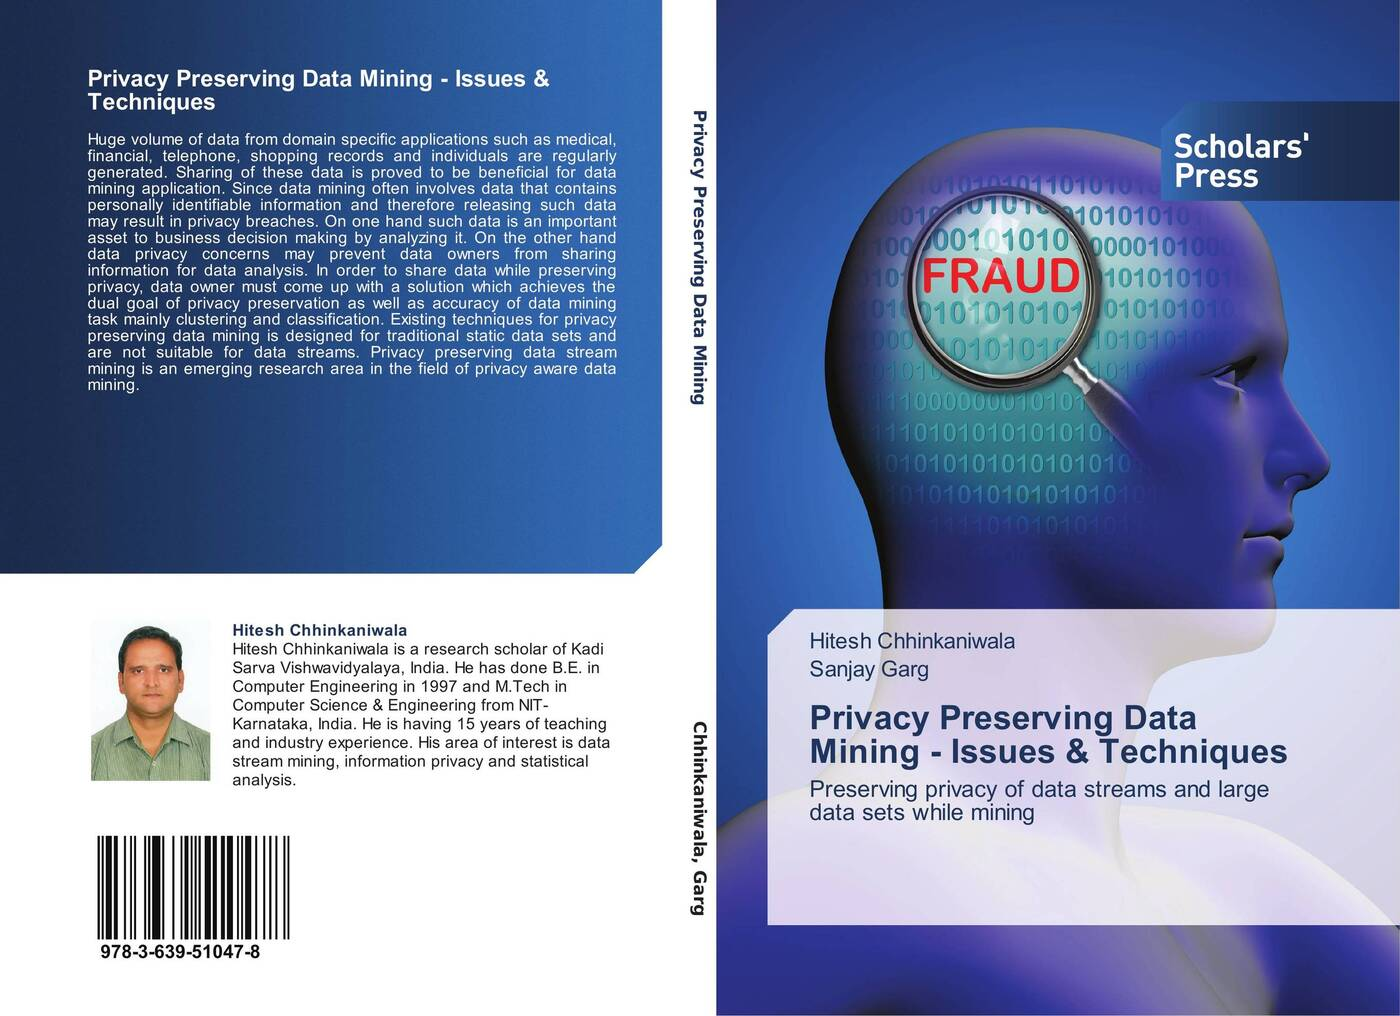 Hitesh Chhinkaniwala and Sanjay Garg Privacy Preserving Data Mining - Issues & Techniques все цены